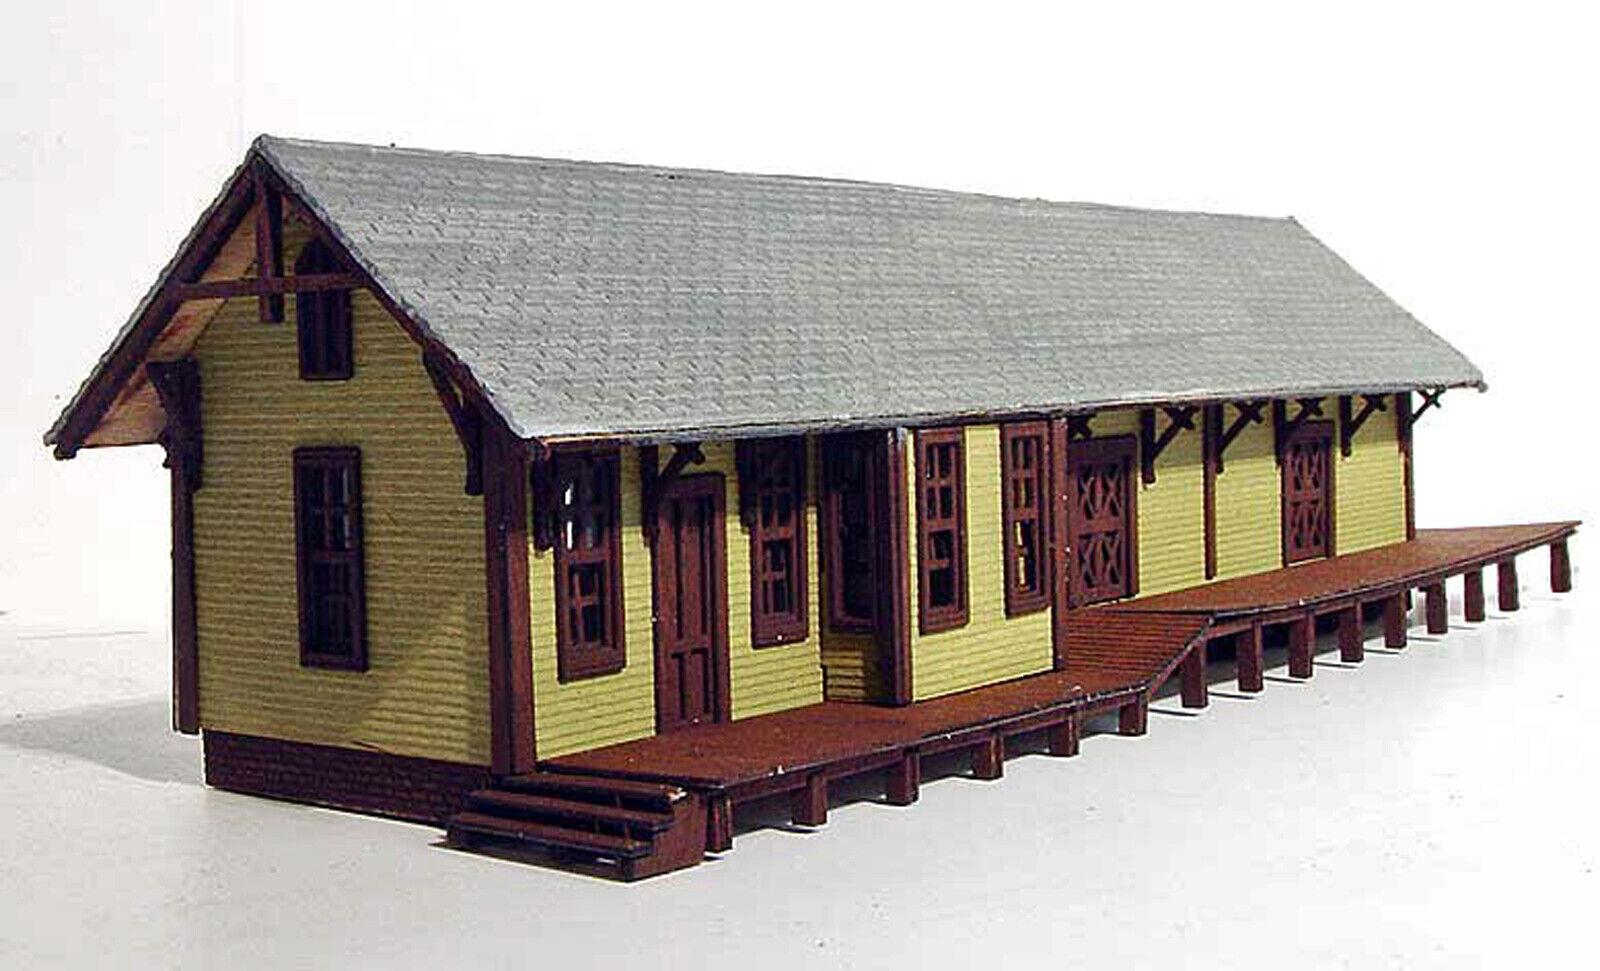 Centro Hall Depot N Scale Model Railroad estructura sin pintar KIT de corte láser LA863